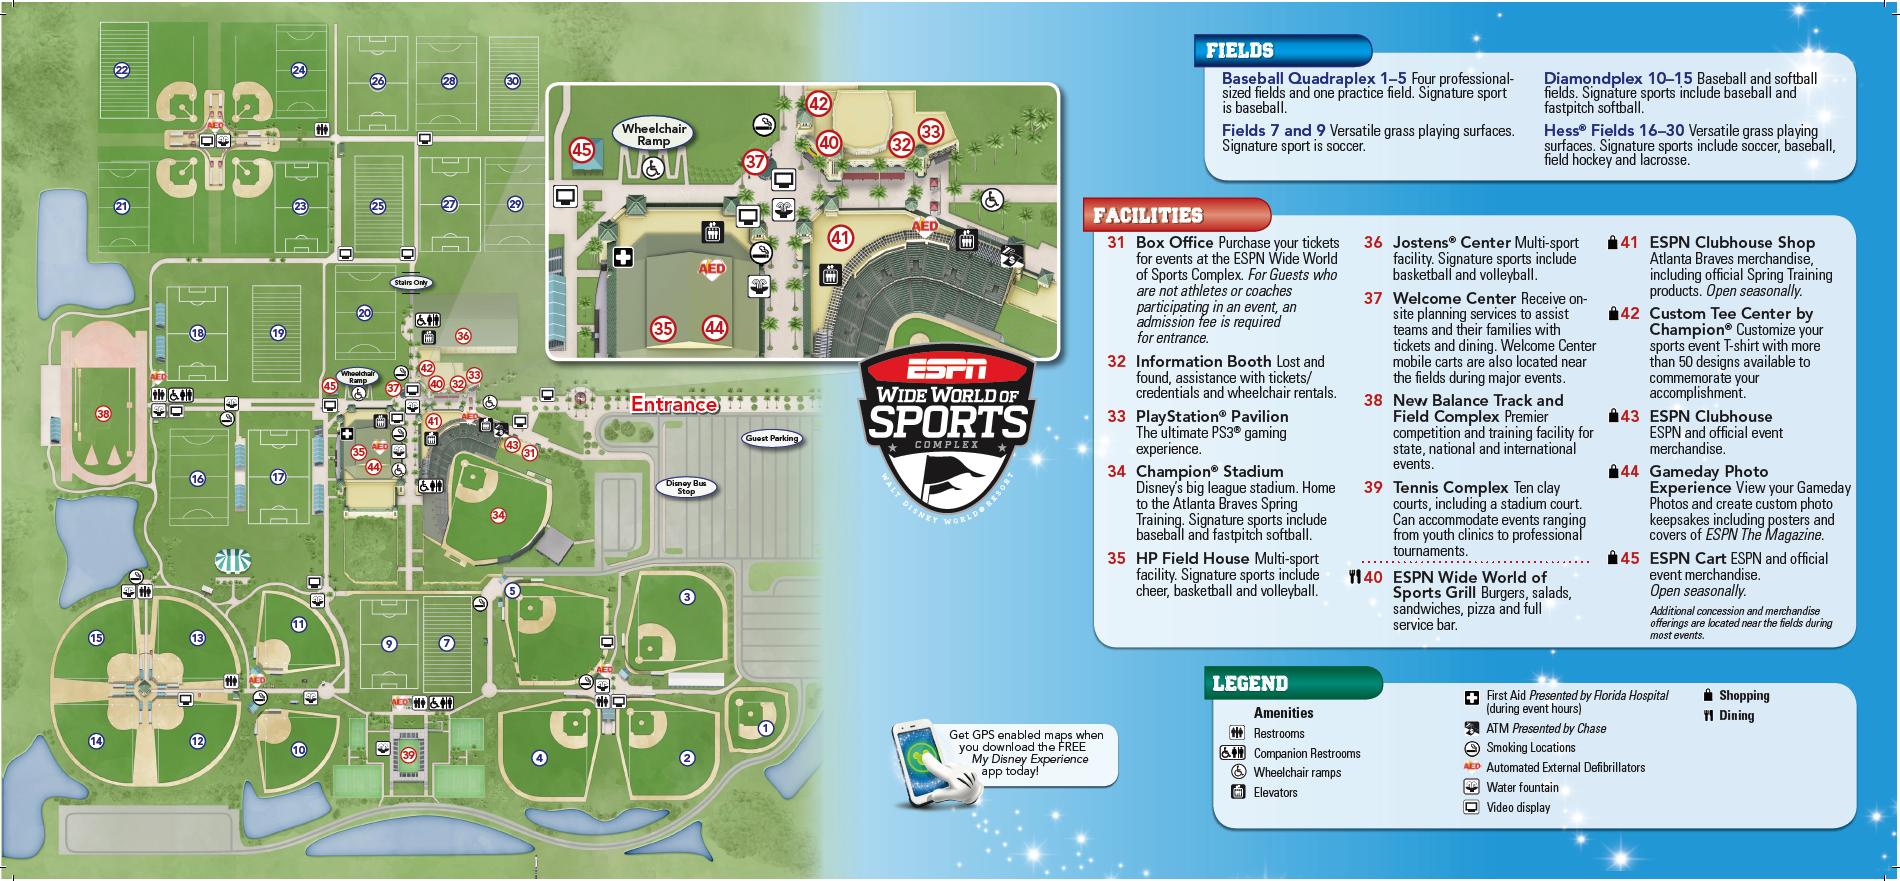 2013 Espn Wide World Of Sports Complex Map Disney World Map Disney World Parks Disney Map